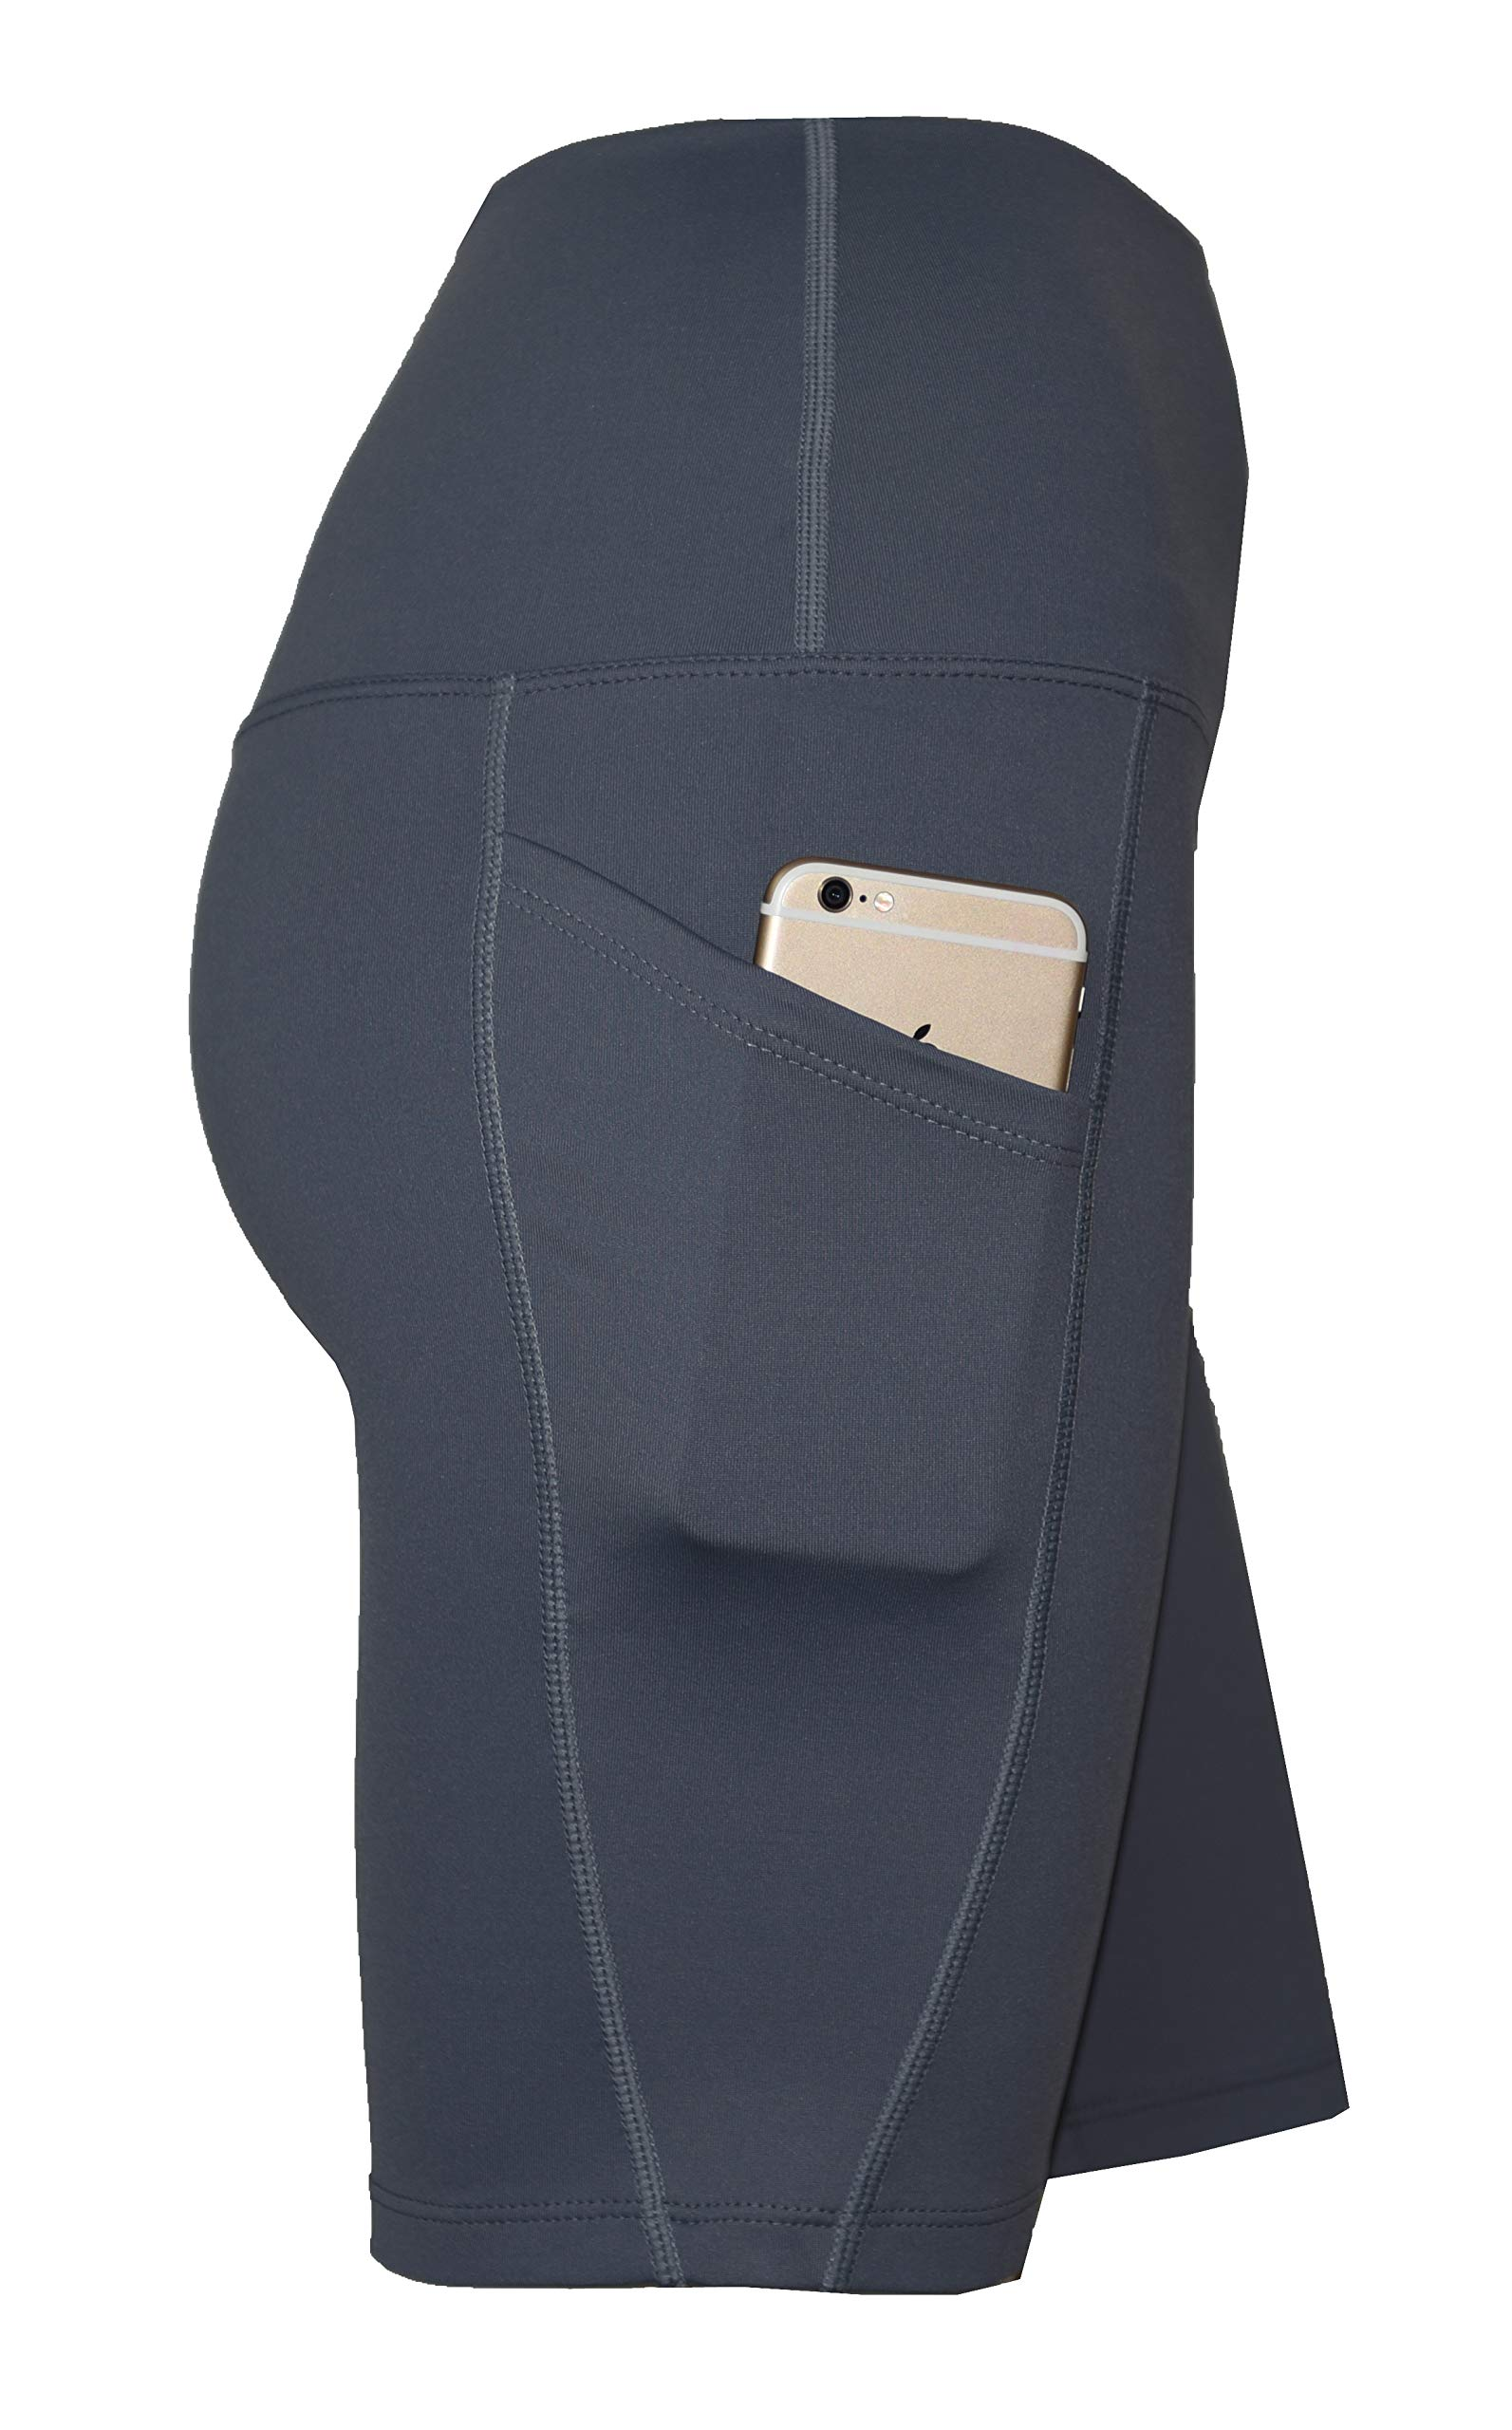 Private Island Women UV Swim Rash Guard Board Shorts Pants Yoga (XL, Grey) by Private Island